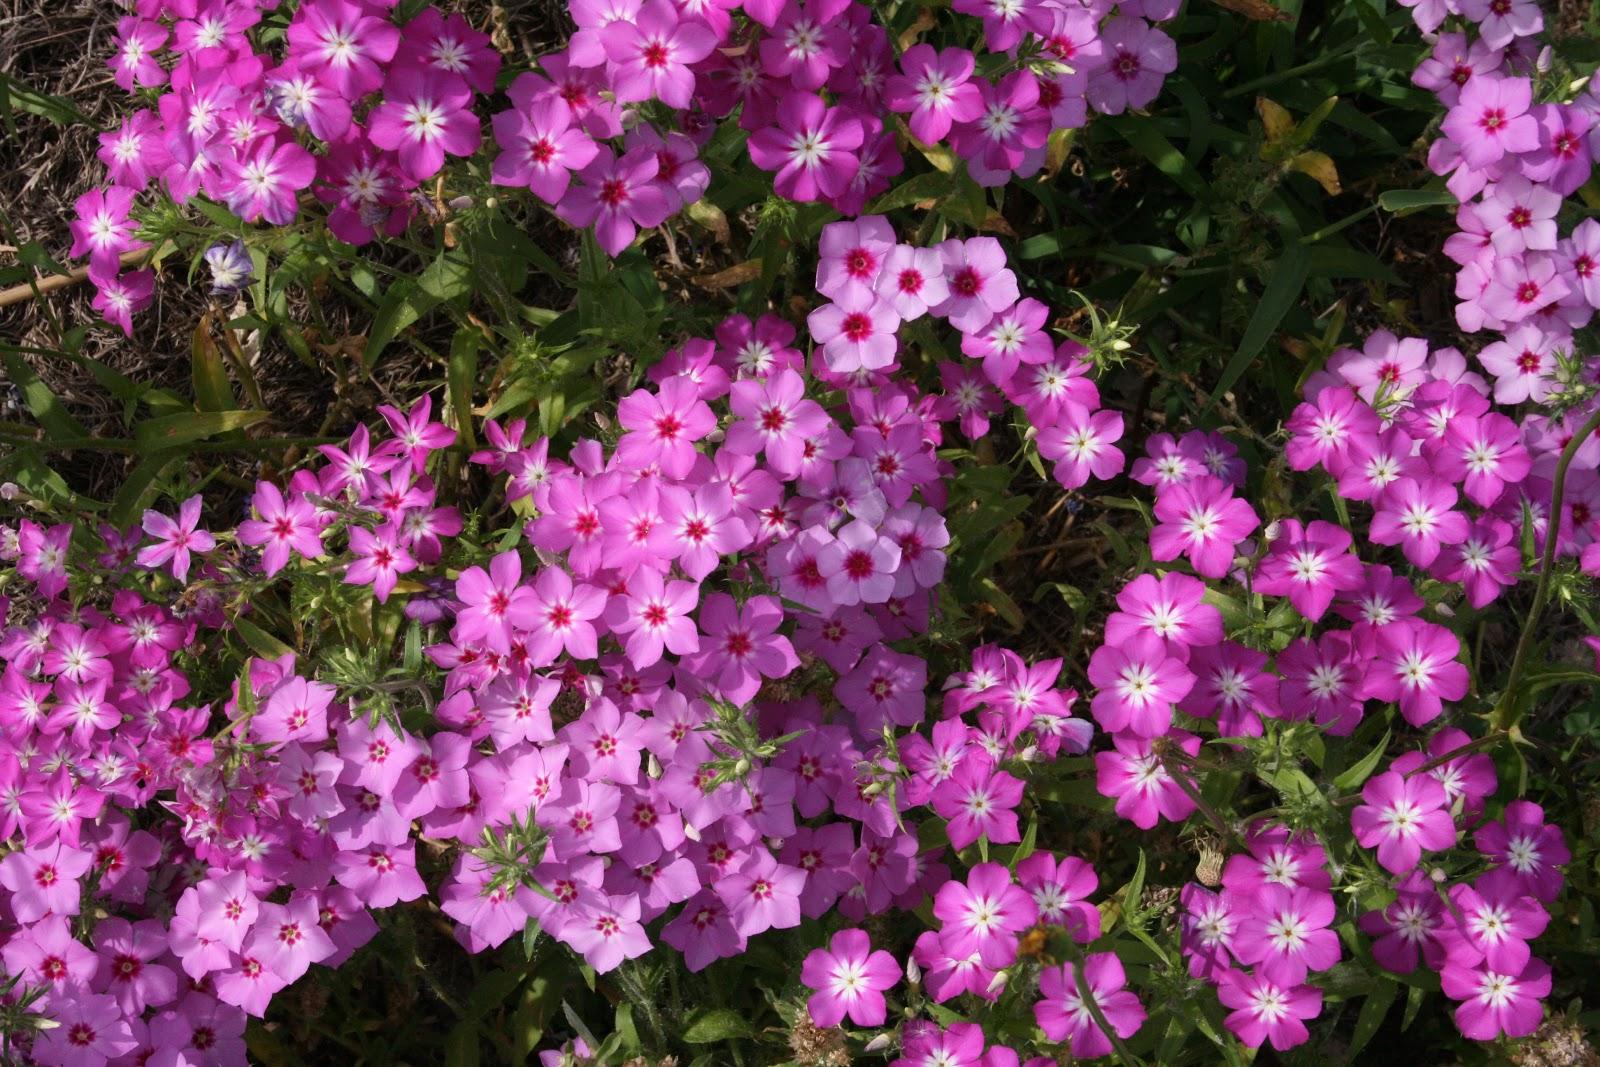 Native Florida Wildflowers Roadside Annual Phlox Phlox Drummondii